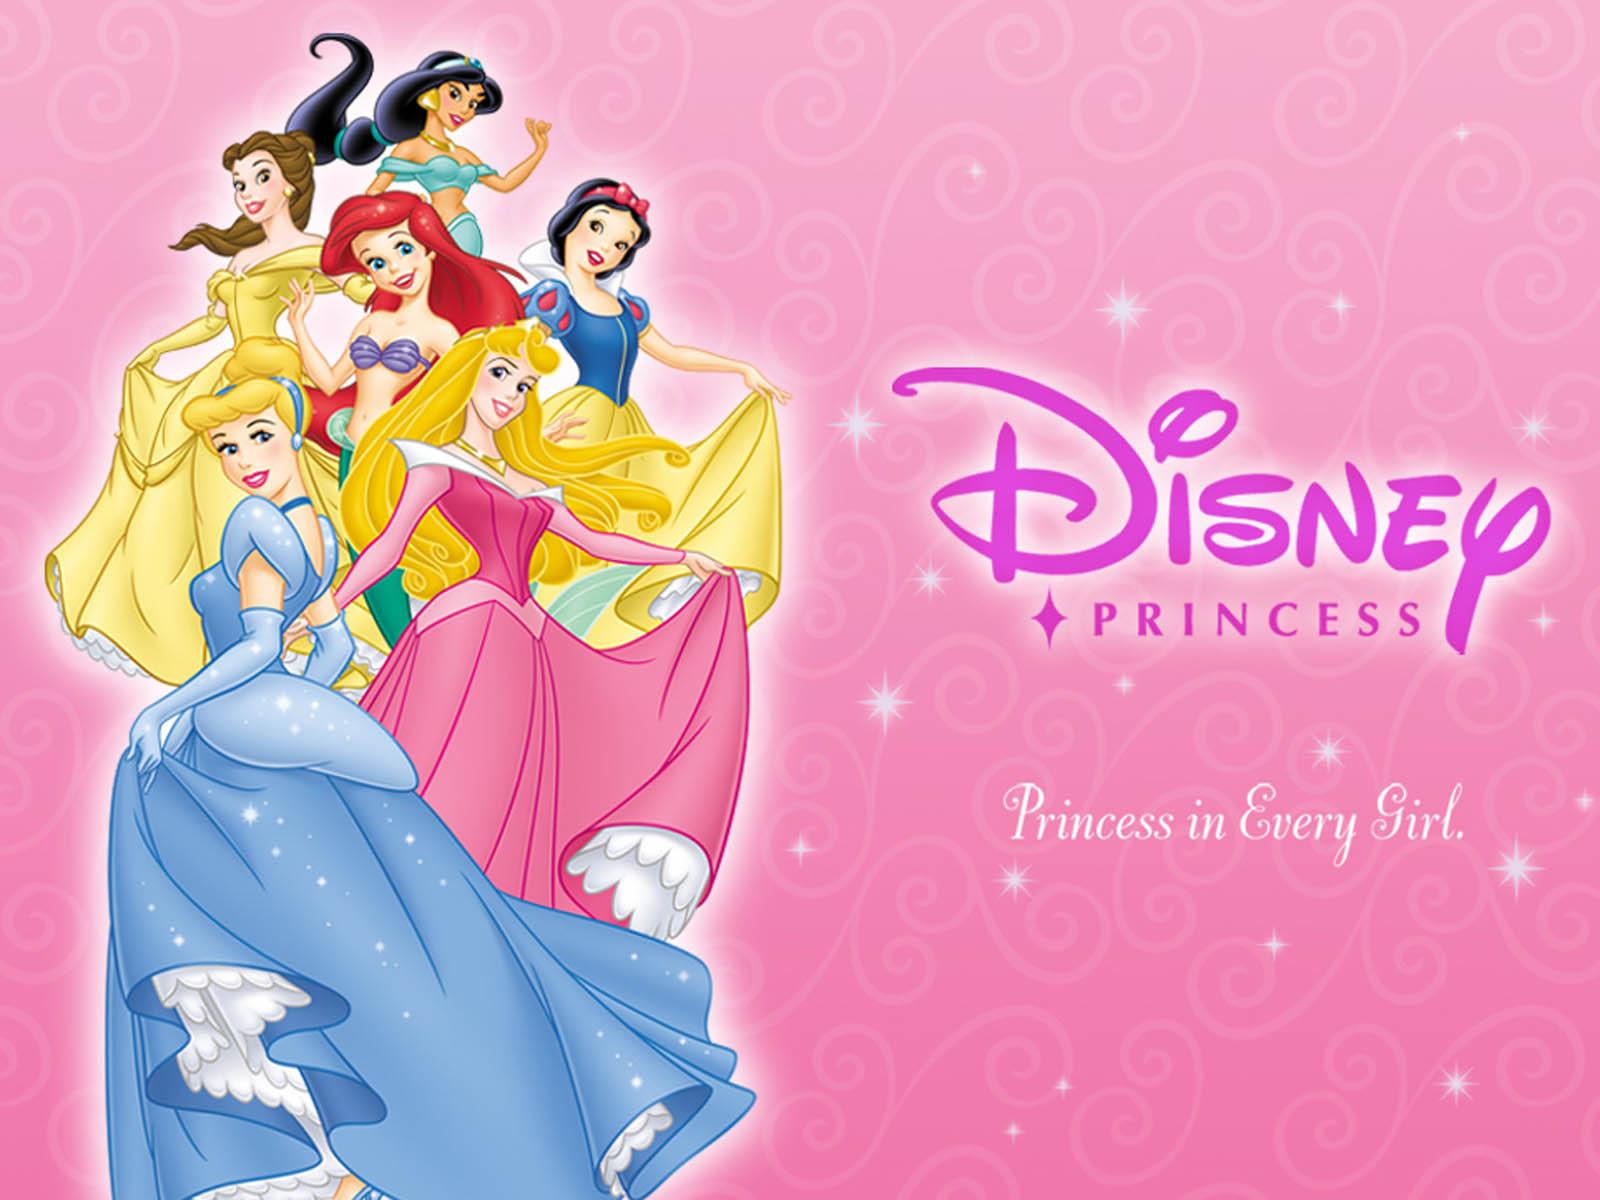 Disney Princess Wallpapers wallpapersHondaCBR 1600x1200